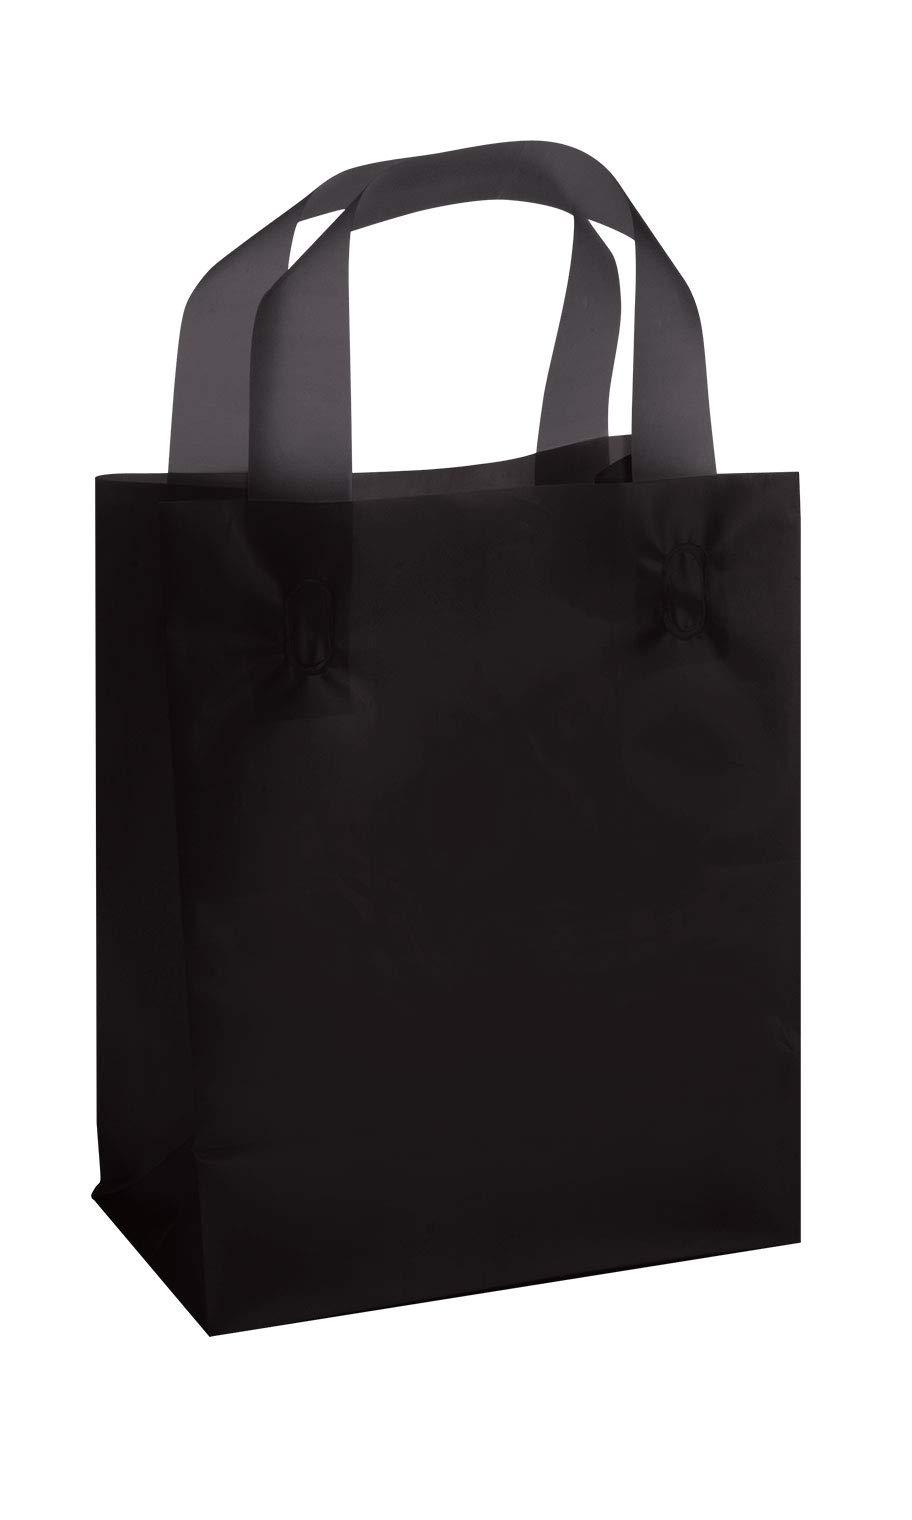 SSWBasics Medium Black Frosted Plastic Shopping Bags - 8'' x 5'' x 10'' - Case of 100